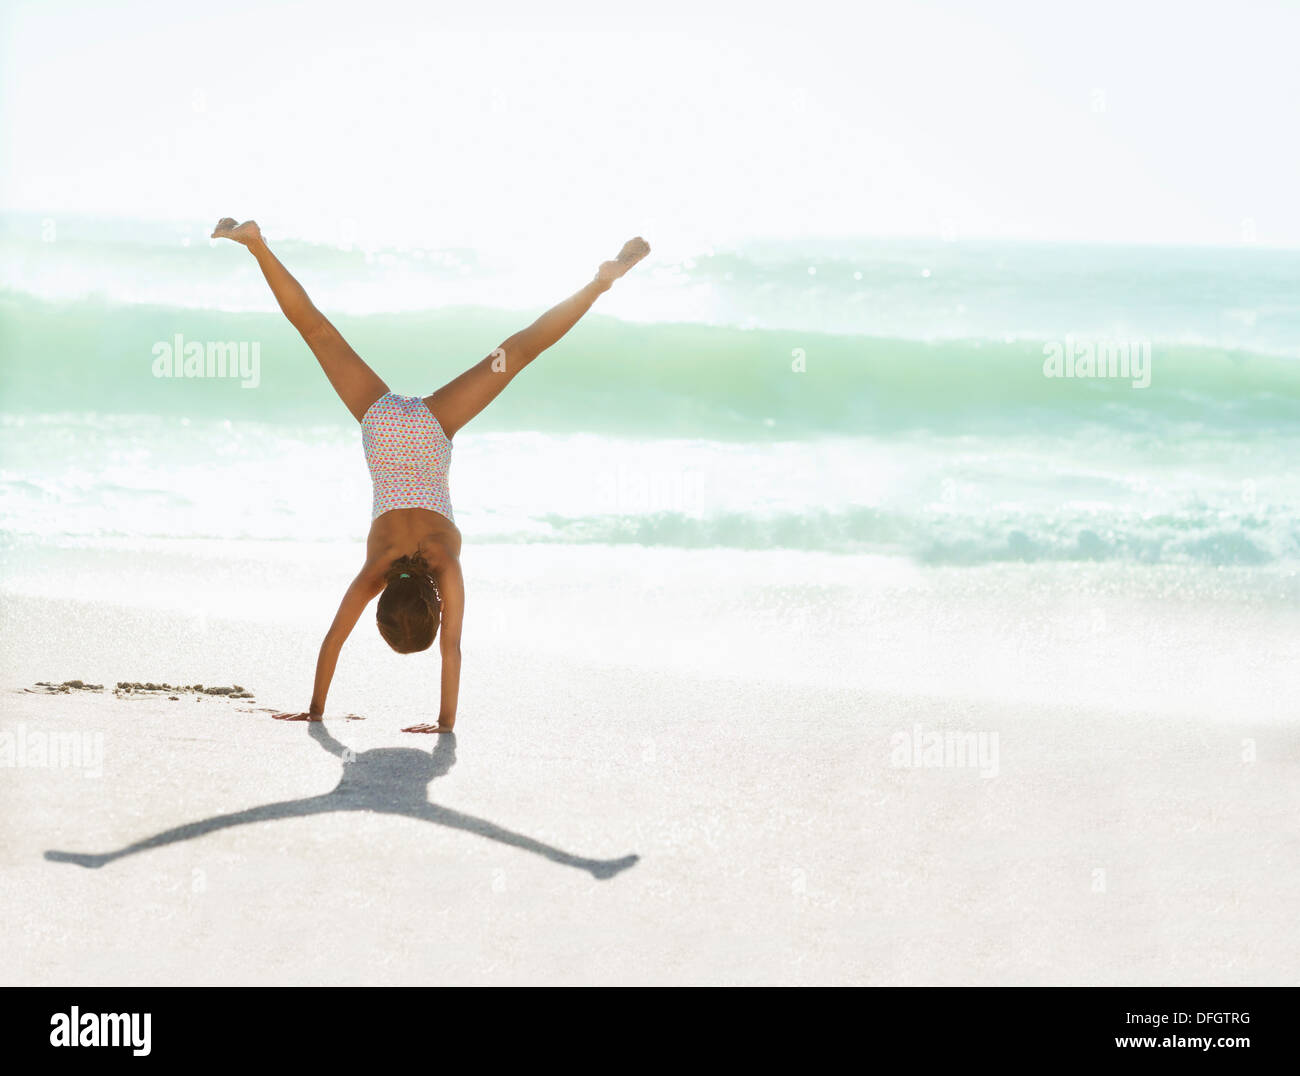 Girl doing cartwheel on beach - Stock Image